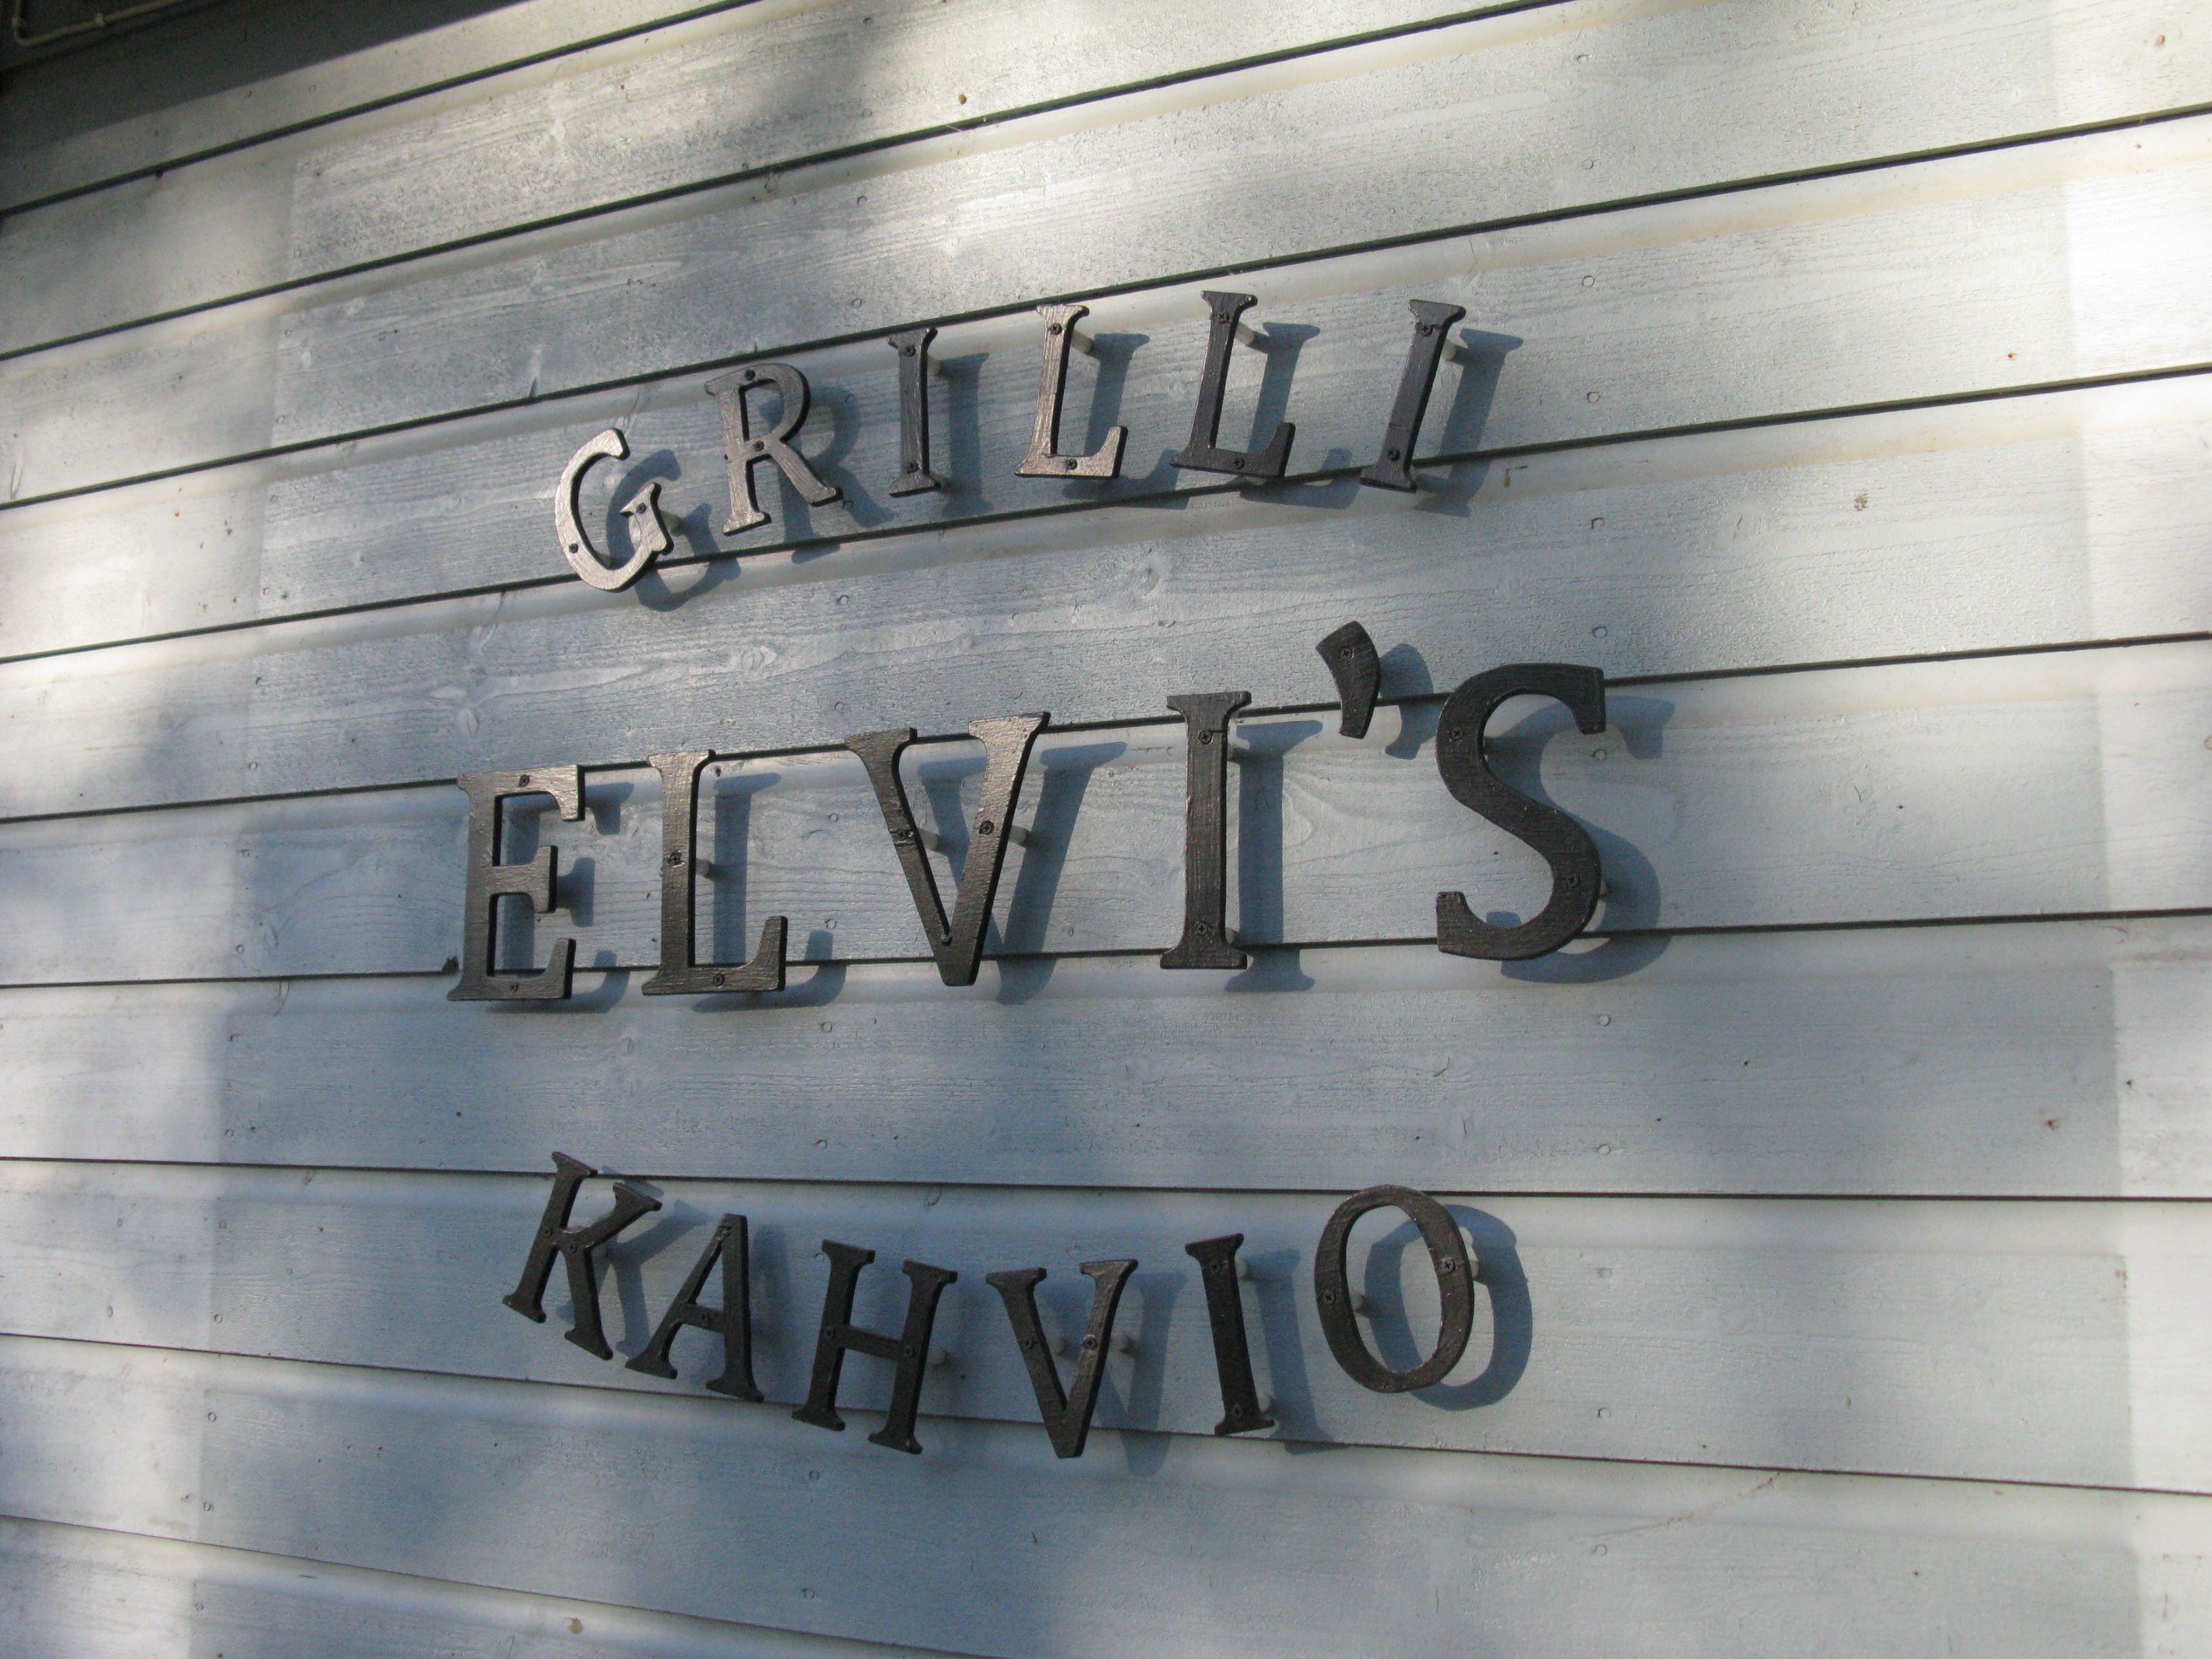 Grill-cafeteria Elvi's